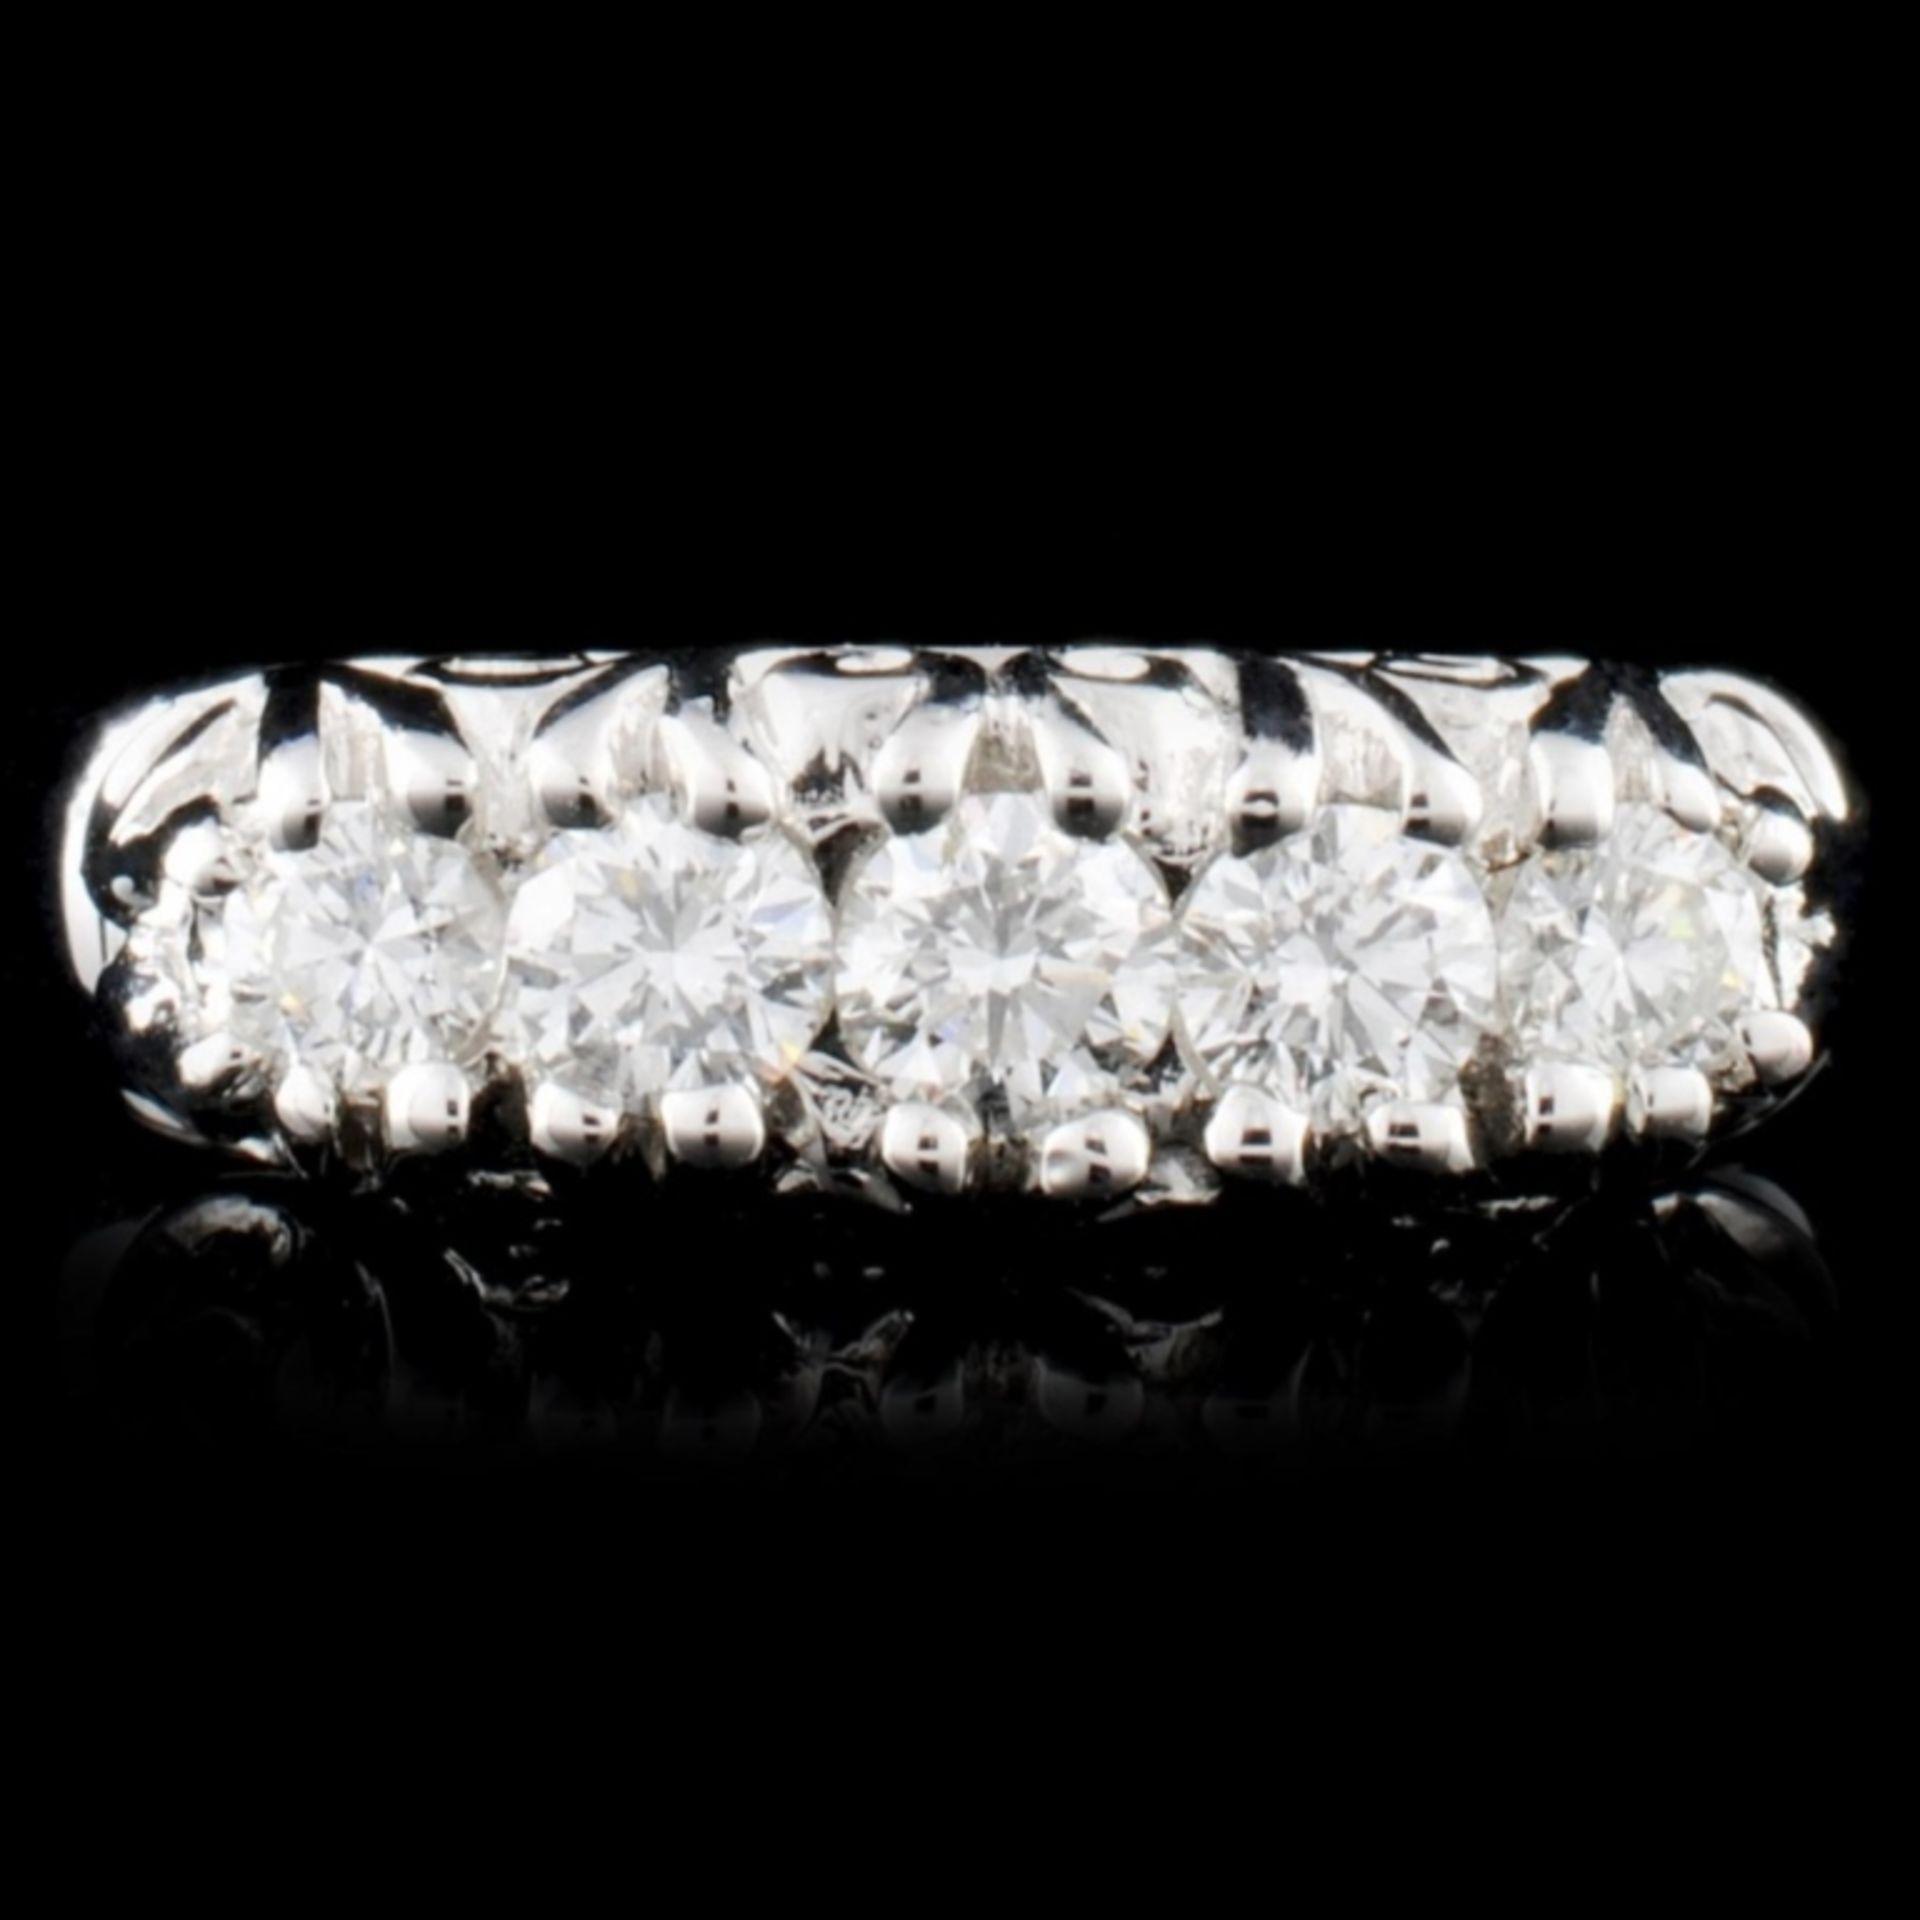 18K Gold 0.60ctw Diamond Ring - Image 2 of 3